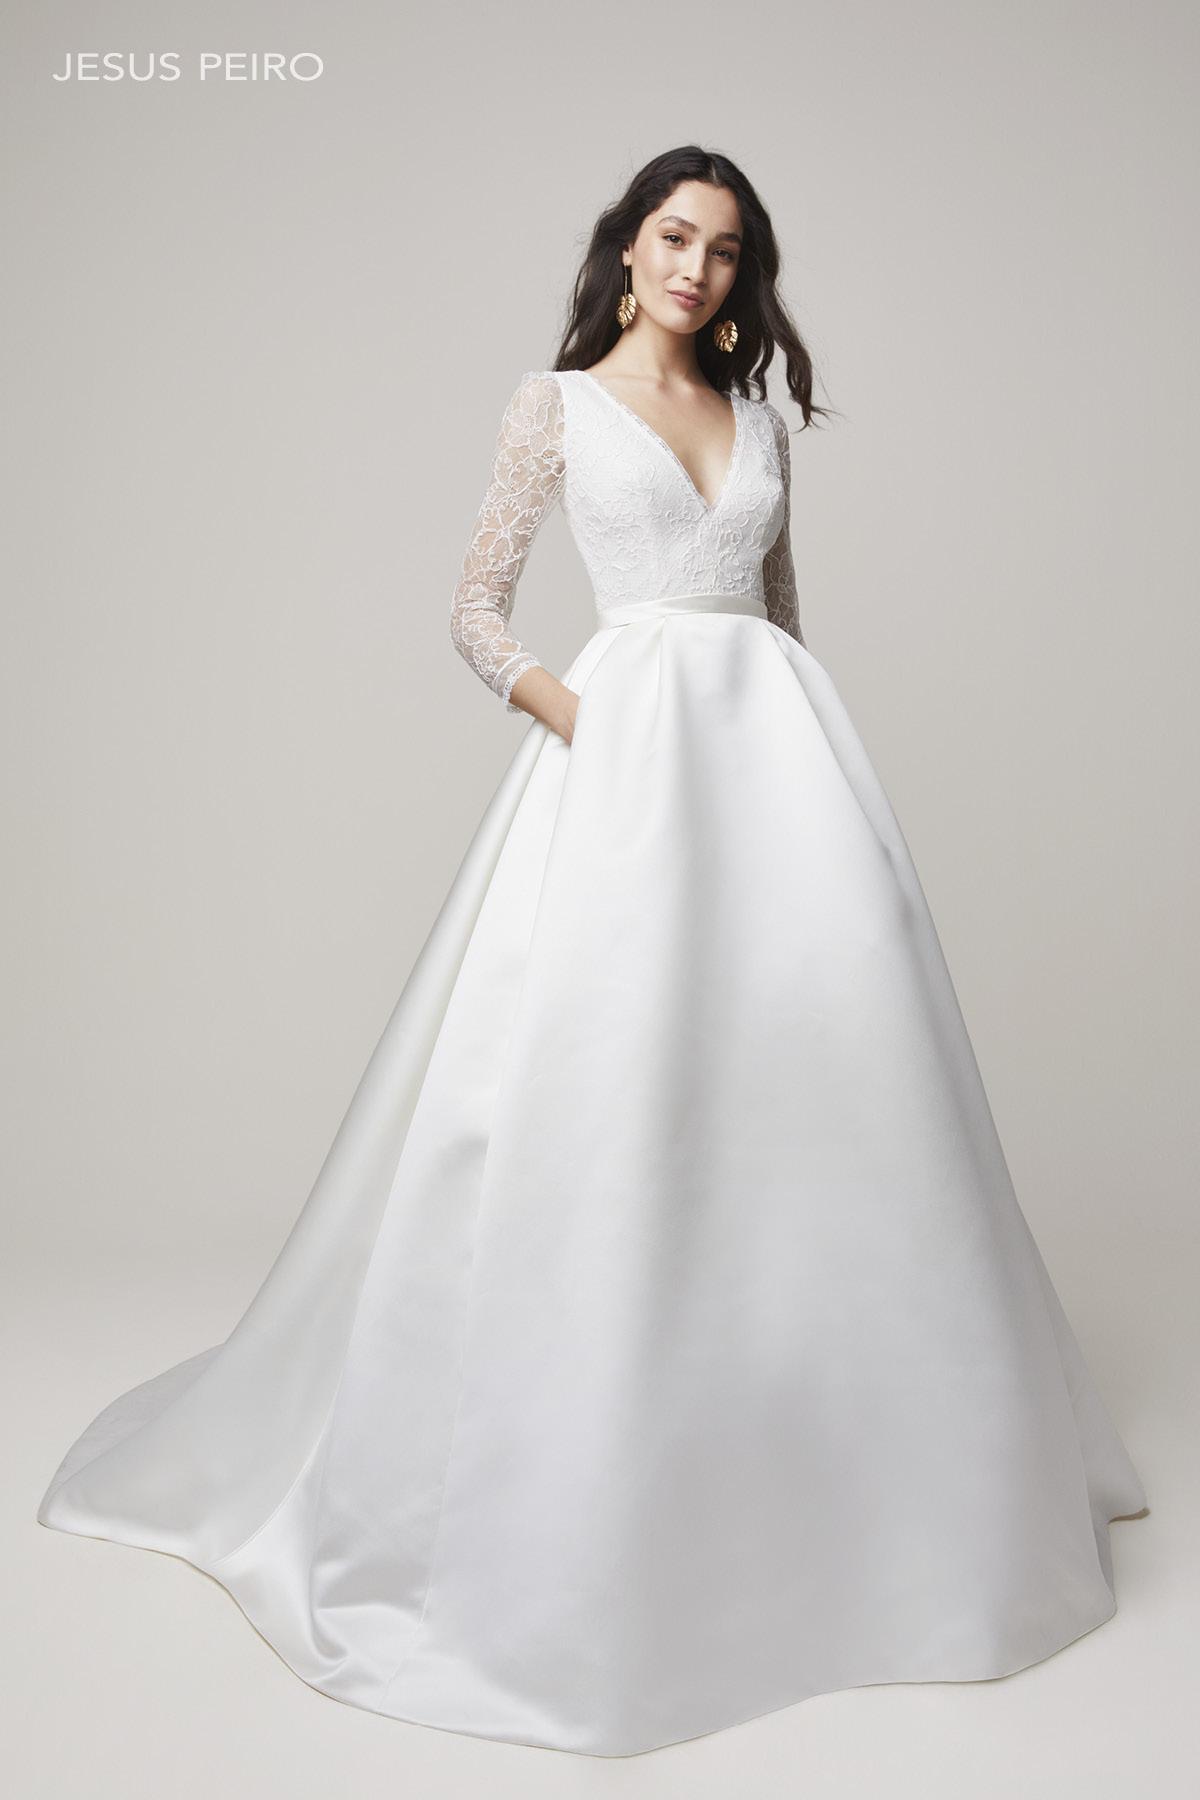 Vestido novia Jesús Peiró Ref.2210